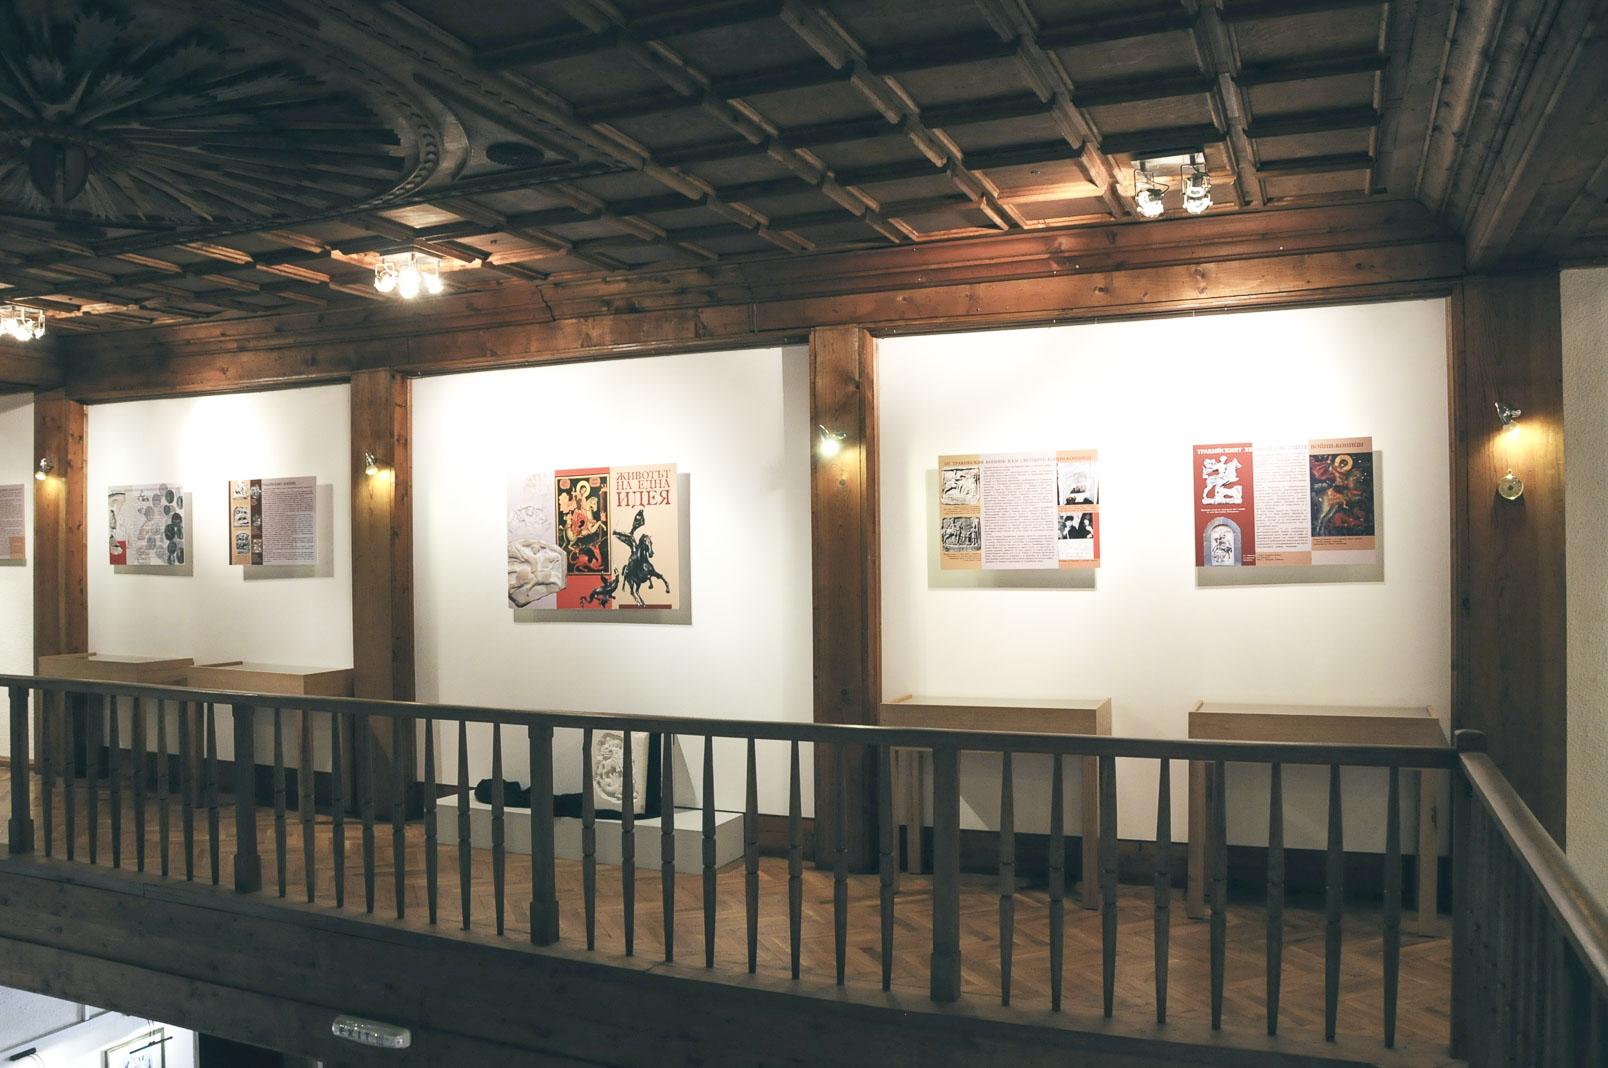 troyan-museum-jivotat-na-edna-idea-42